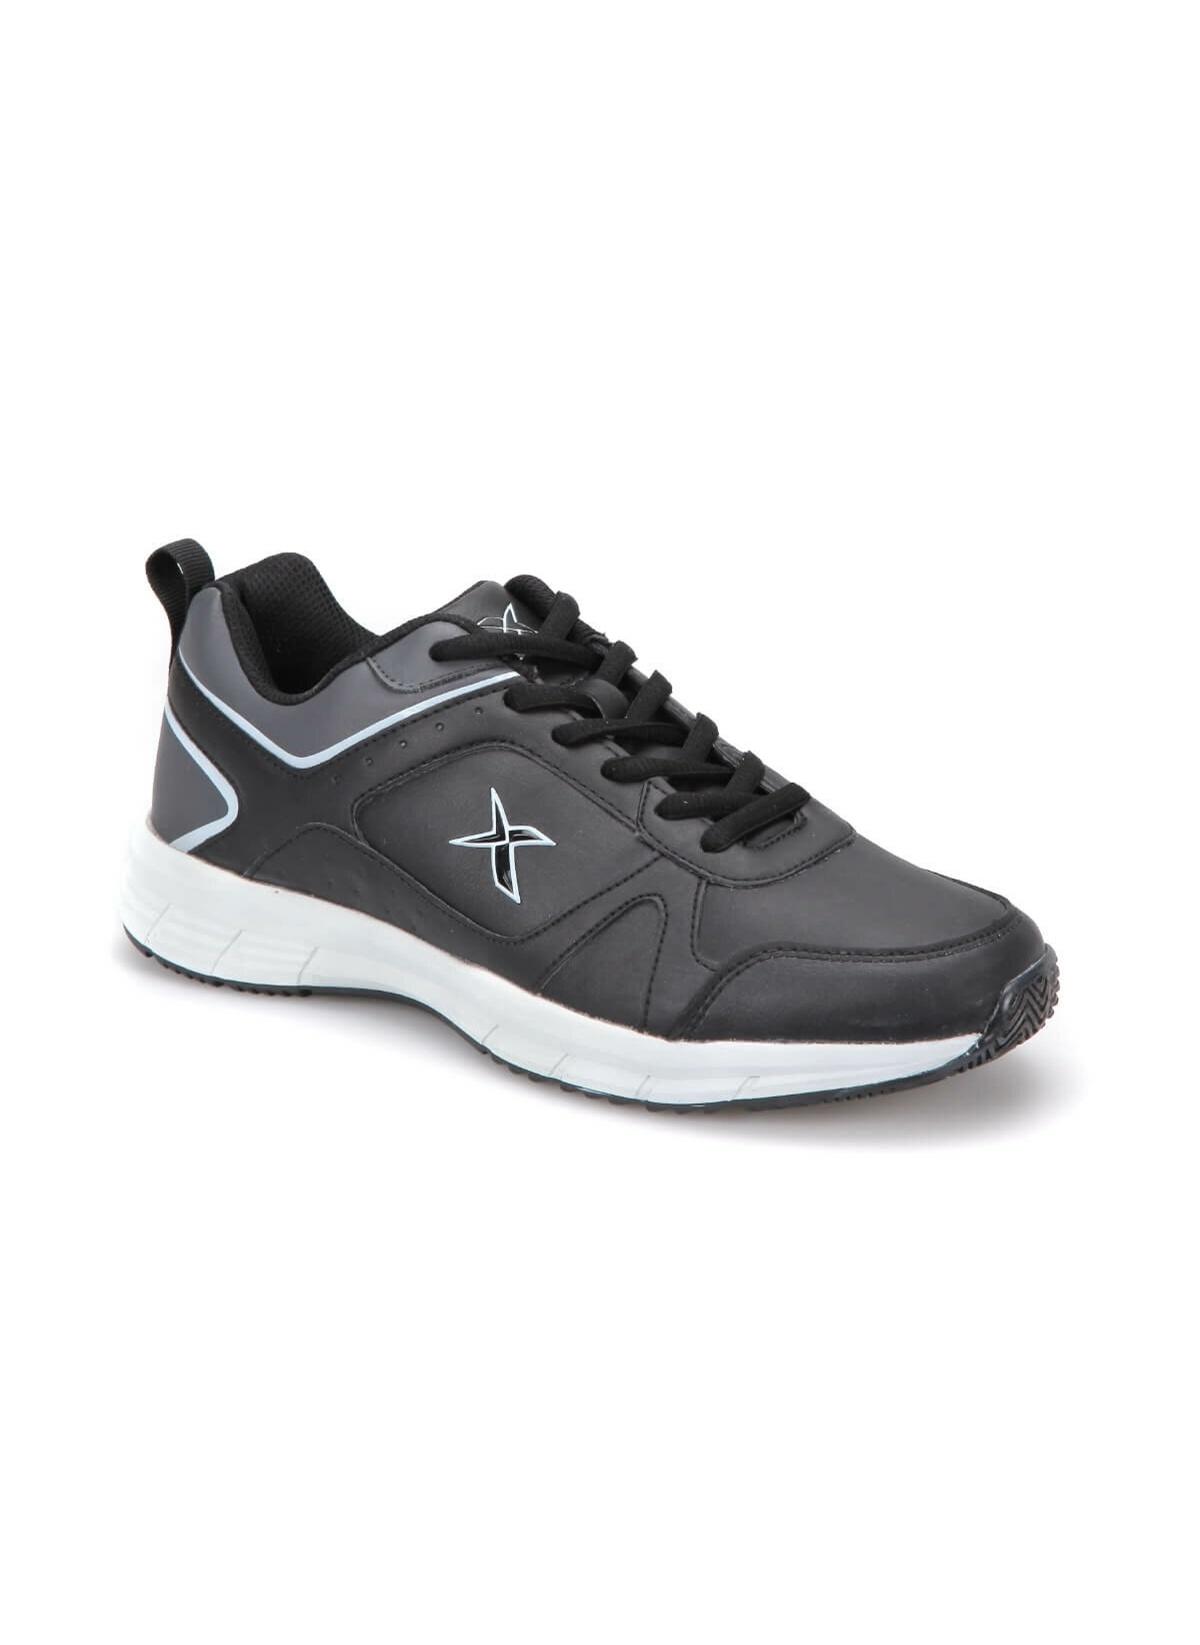 Kinetix Fitness Ayakkabısı Robus Pu Fitness Ayakkabısı – 79.99 TL